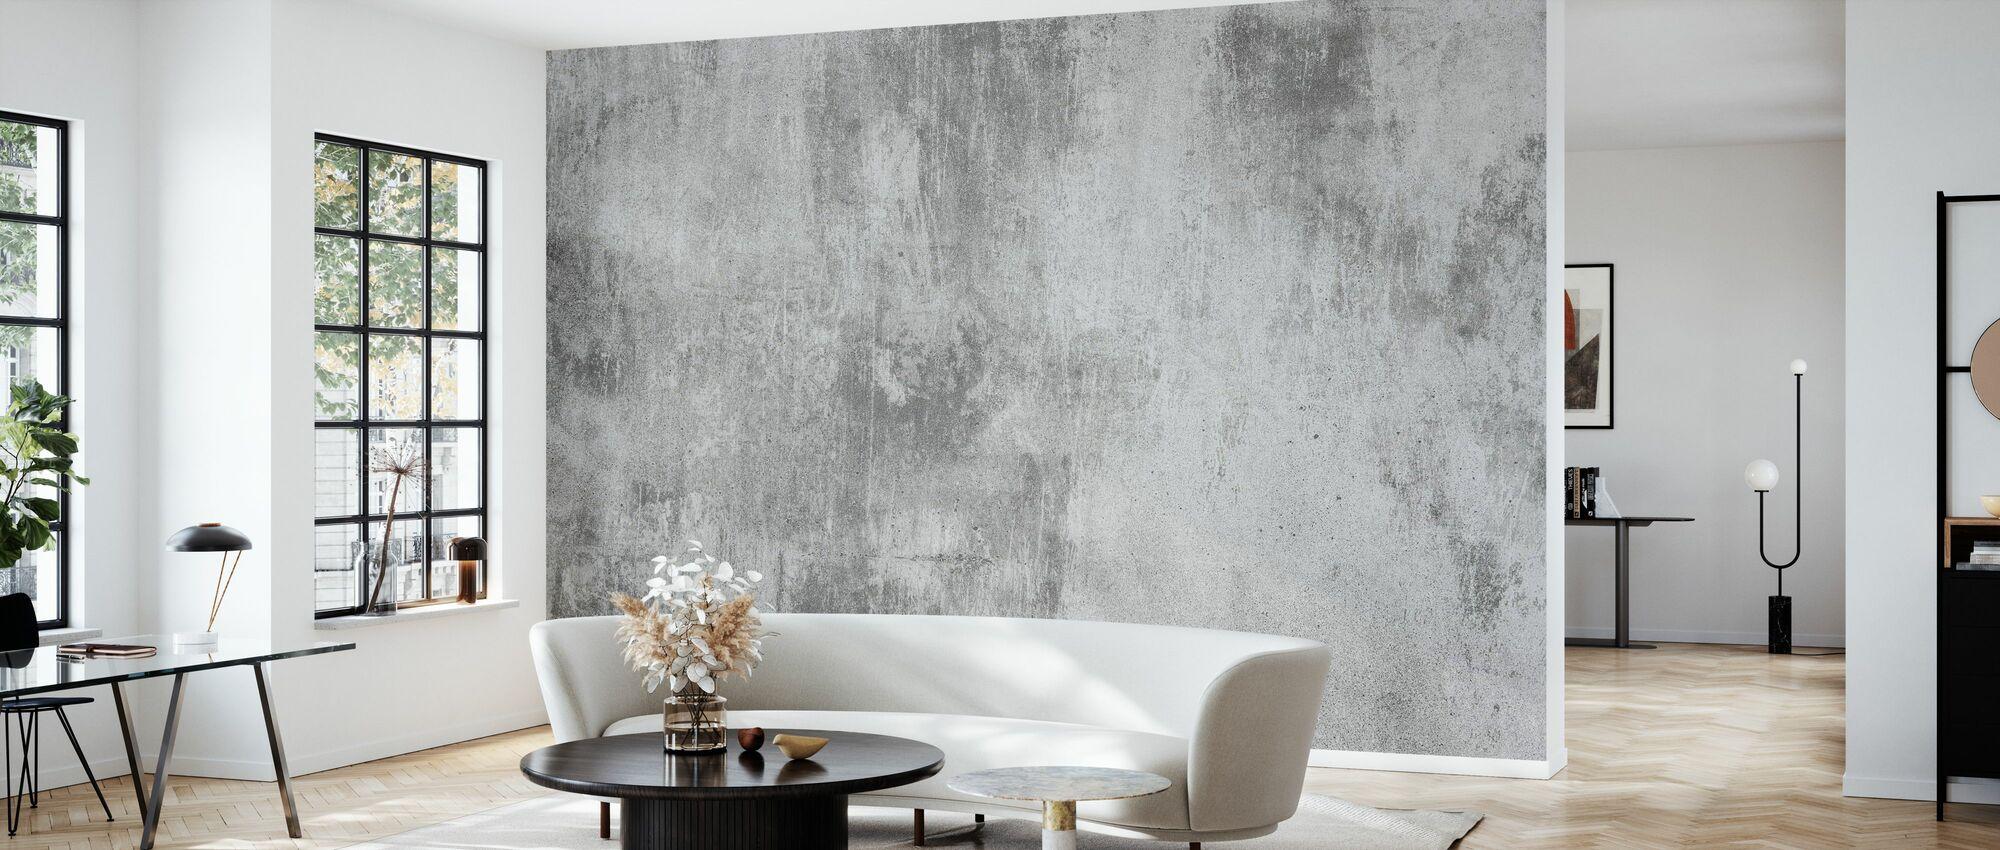 Concrete Wall - Wallpaper - Living Room